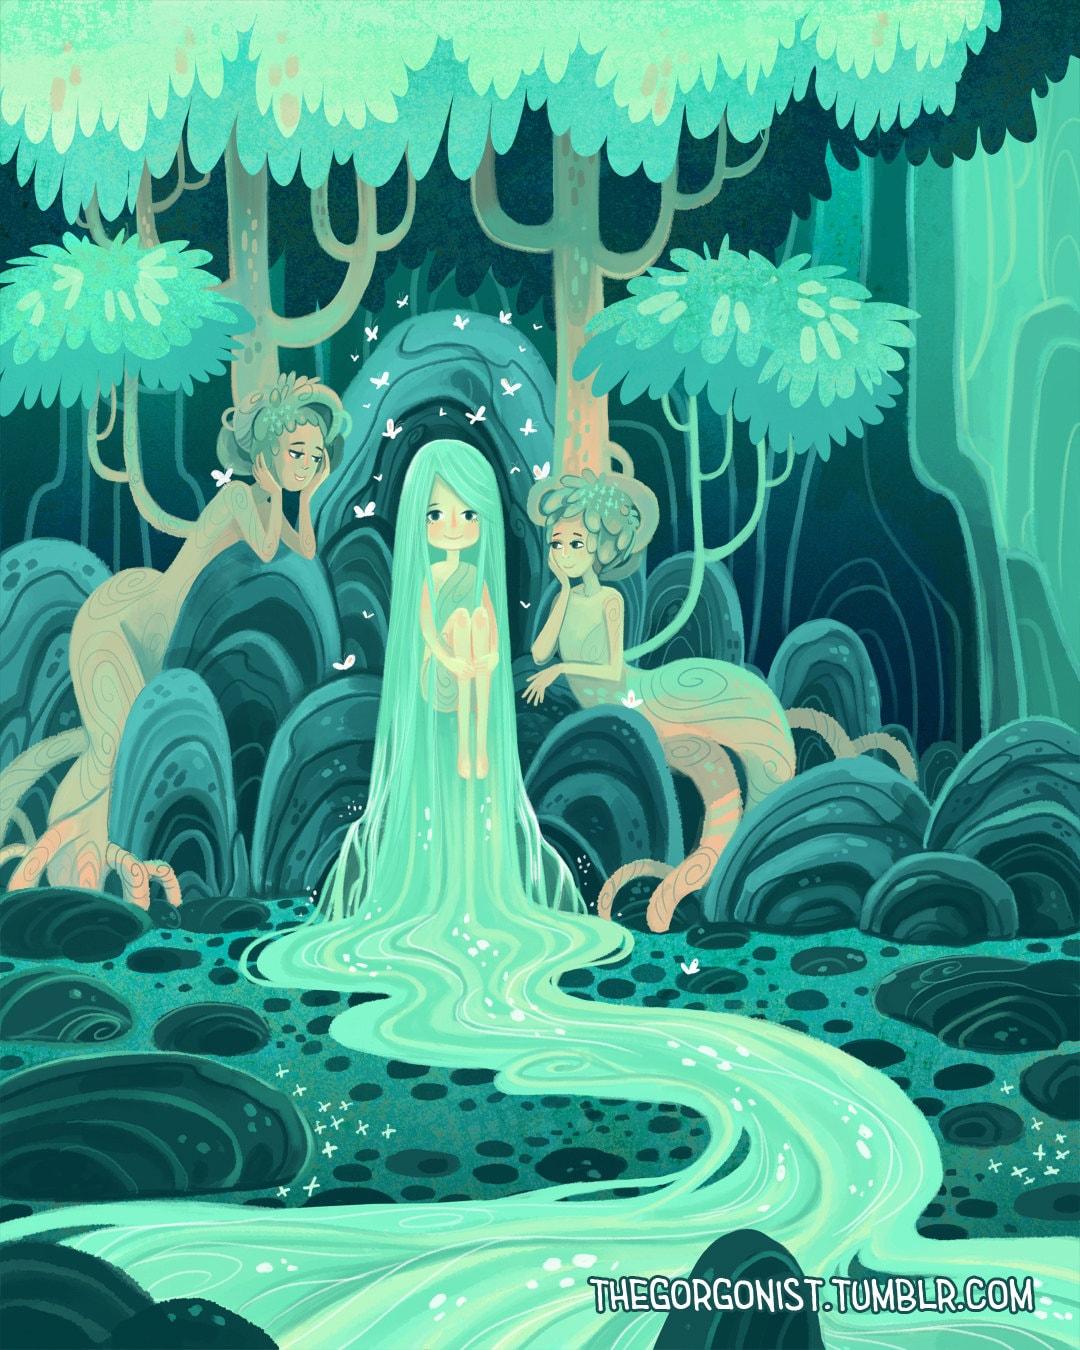 Waterfall Nymph 5x7 inch fantasy art mini print